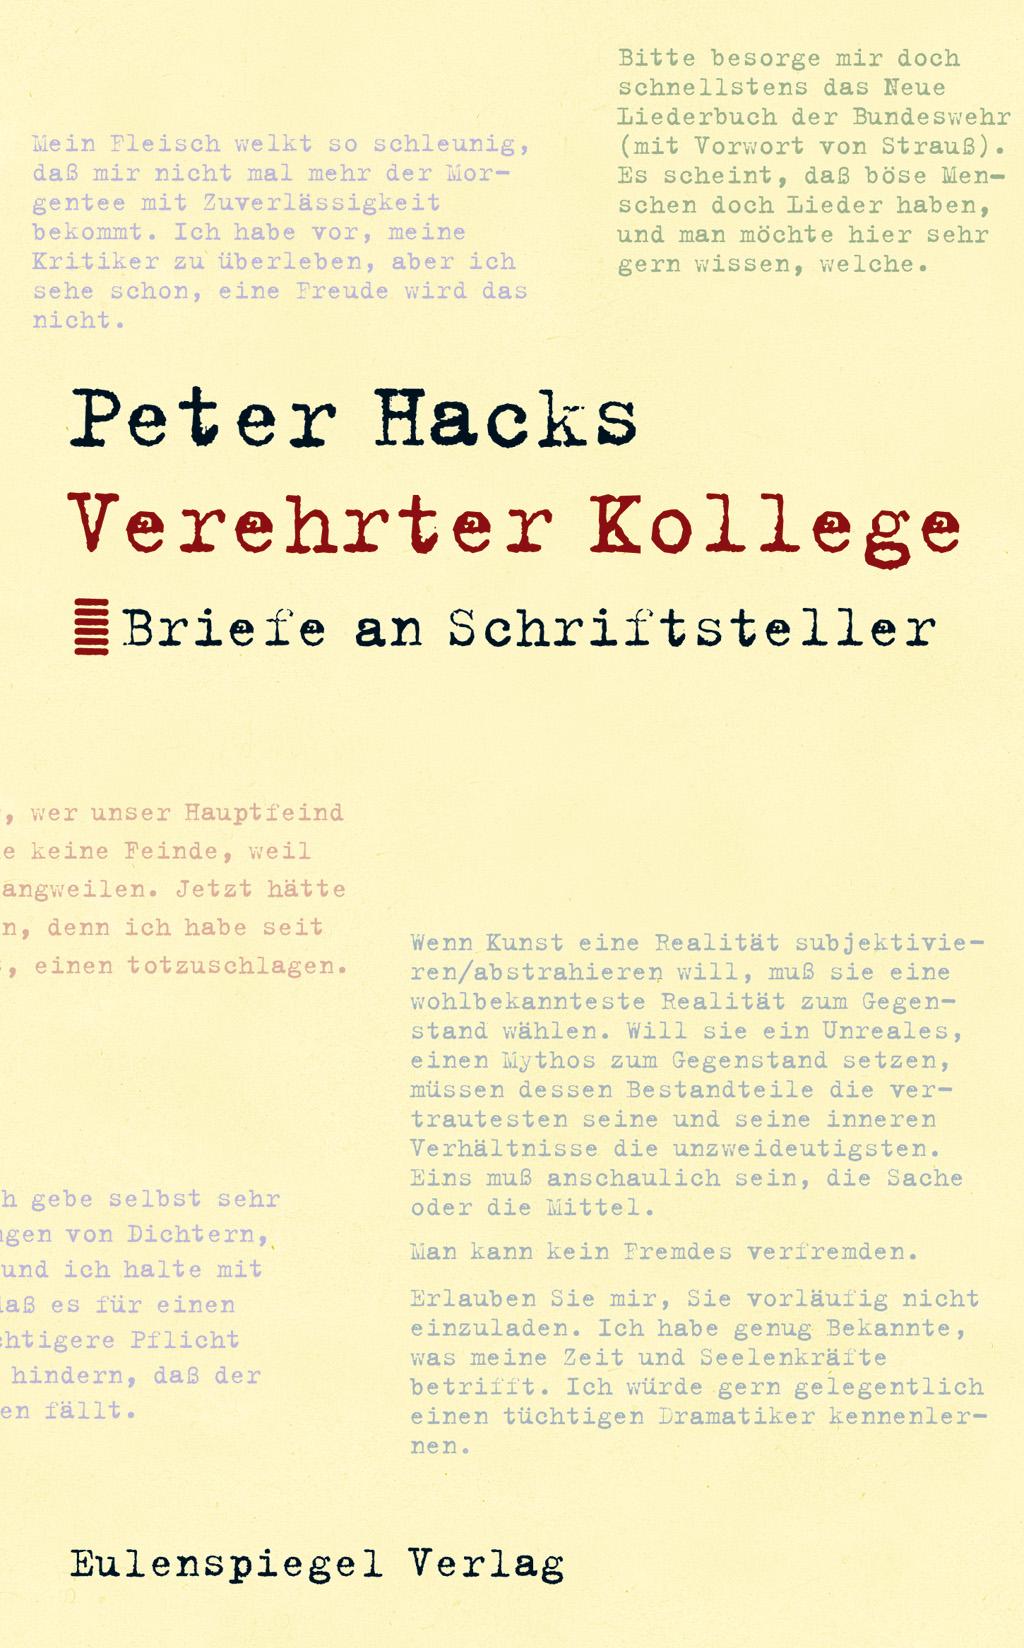 Verehrter Kollege Eulenspiegel Verlag Eulenspiegel Verlagsgruppe